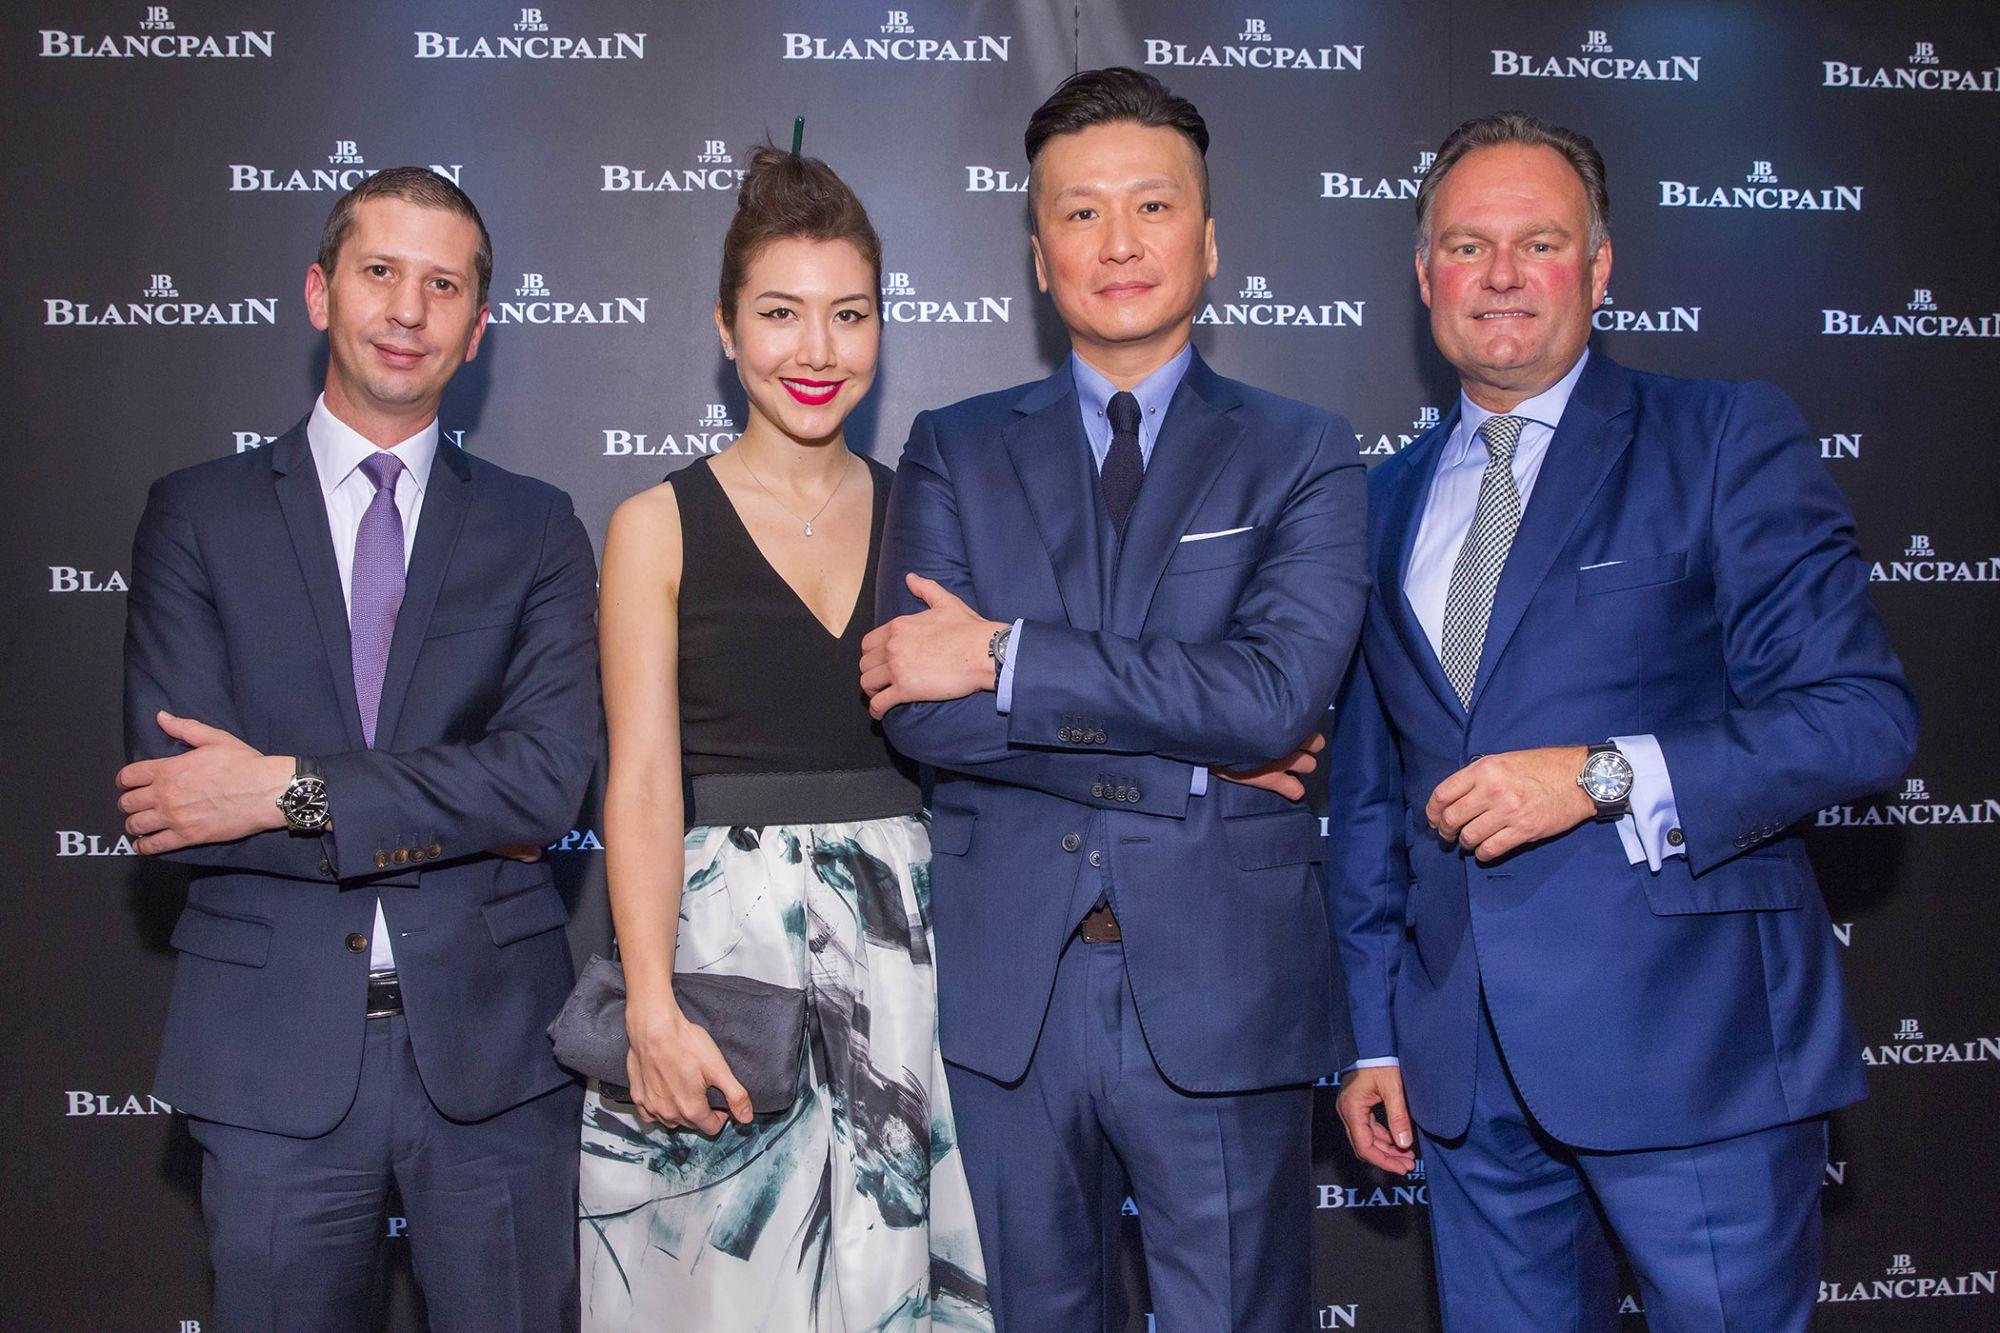 Masters At Work: Appreciating Blancpain's Métiers d'Art Unique Timepieces